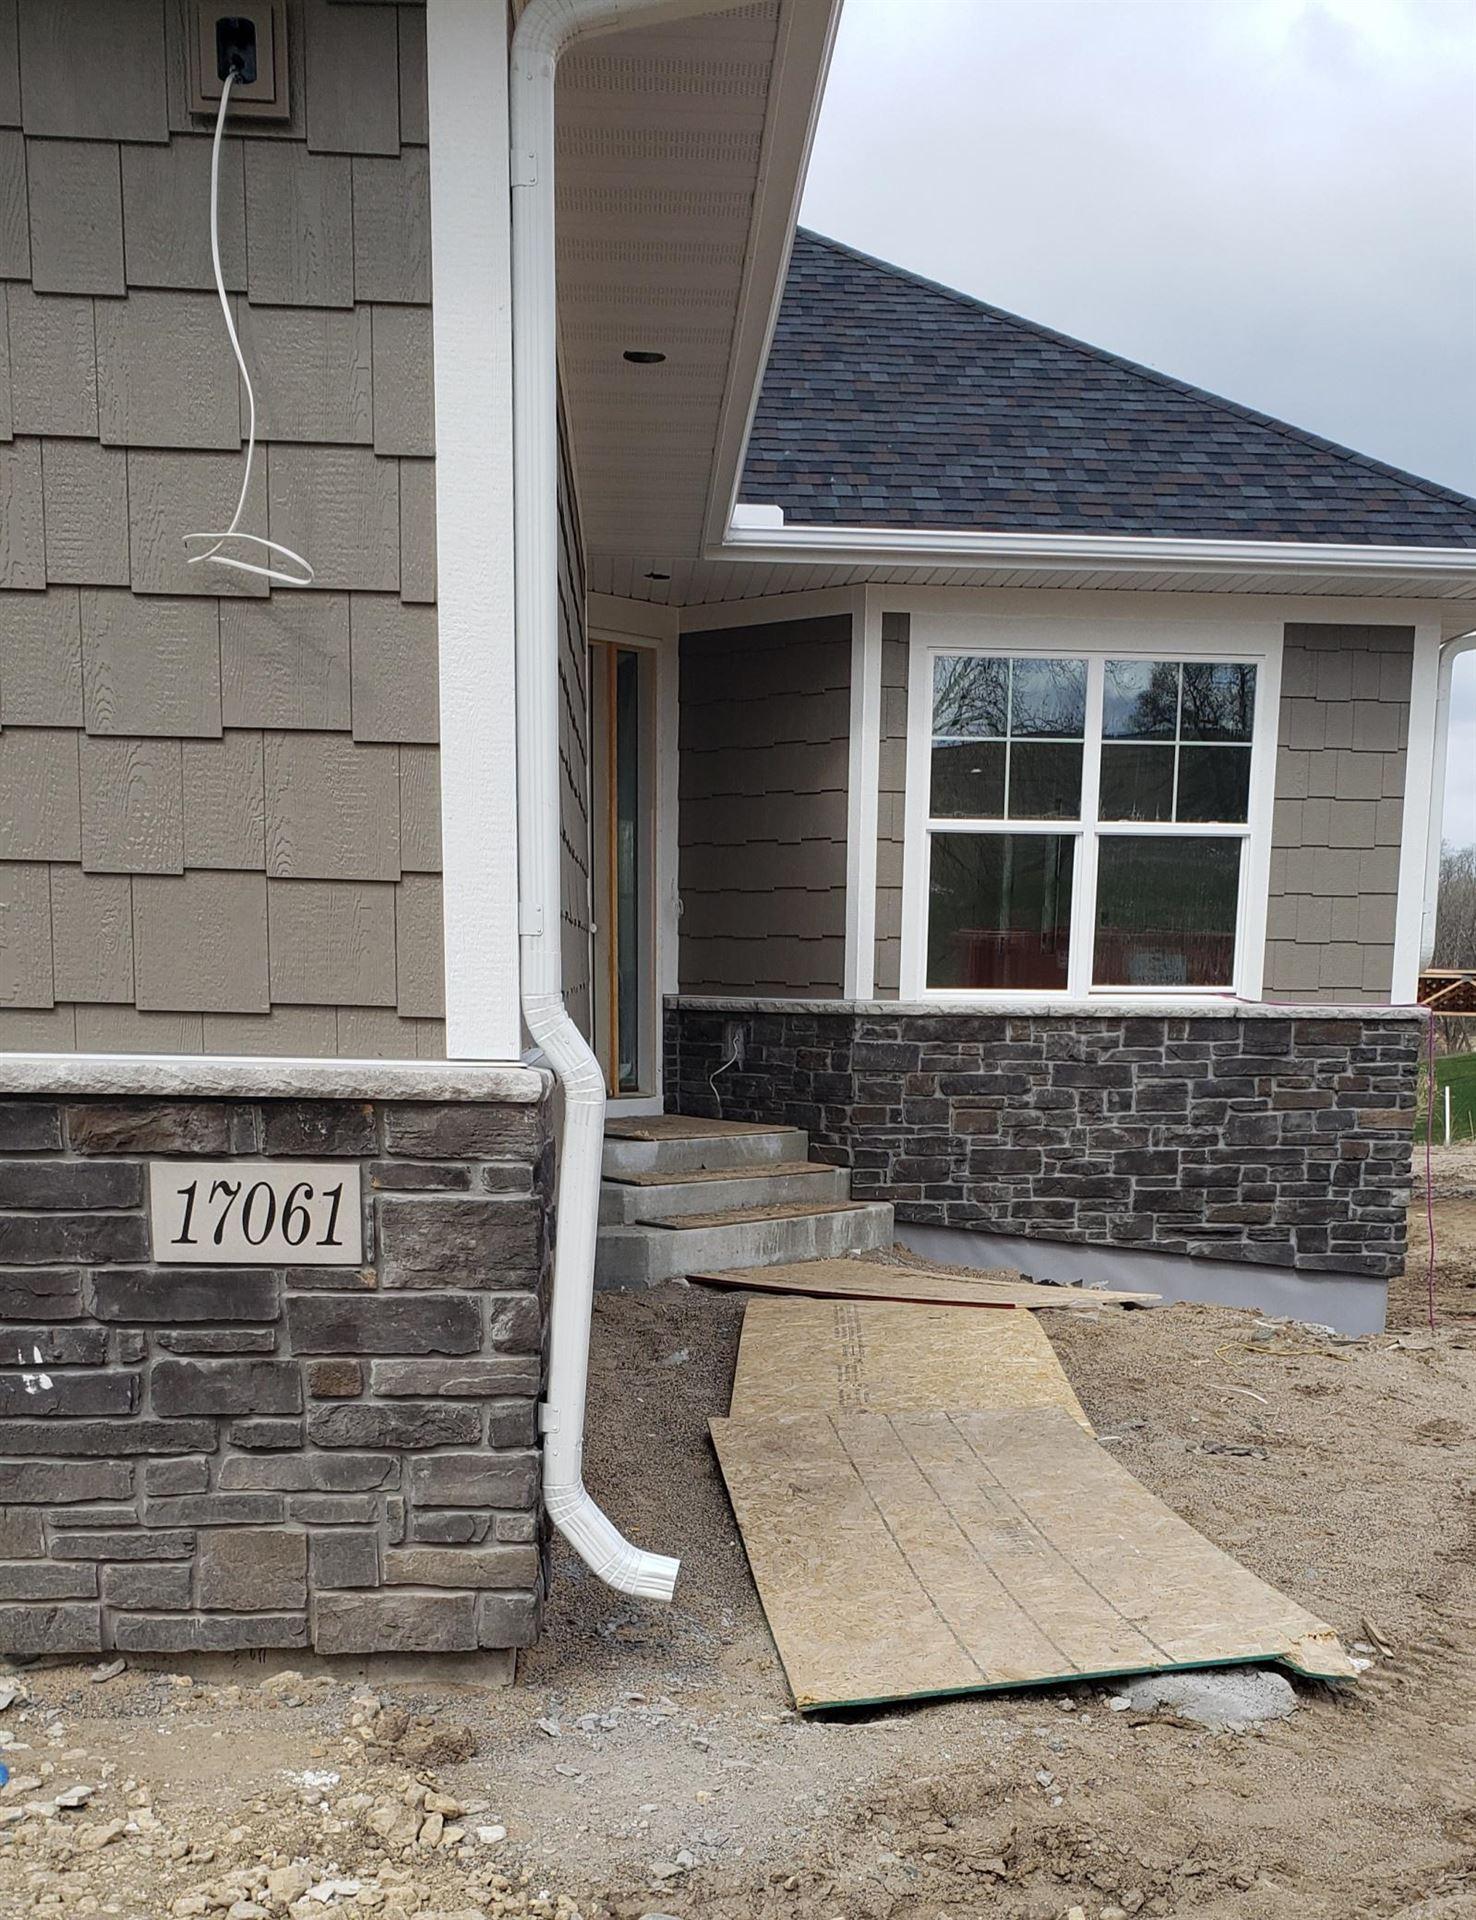 Photo of 17061 Kerrick Court, Lakeville, MN 55044 (MLS # 5742991)